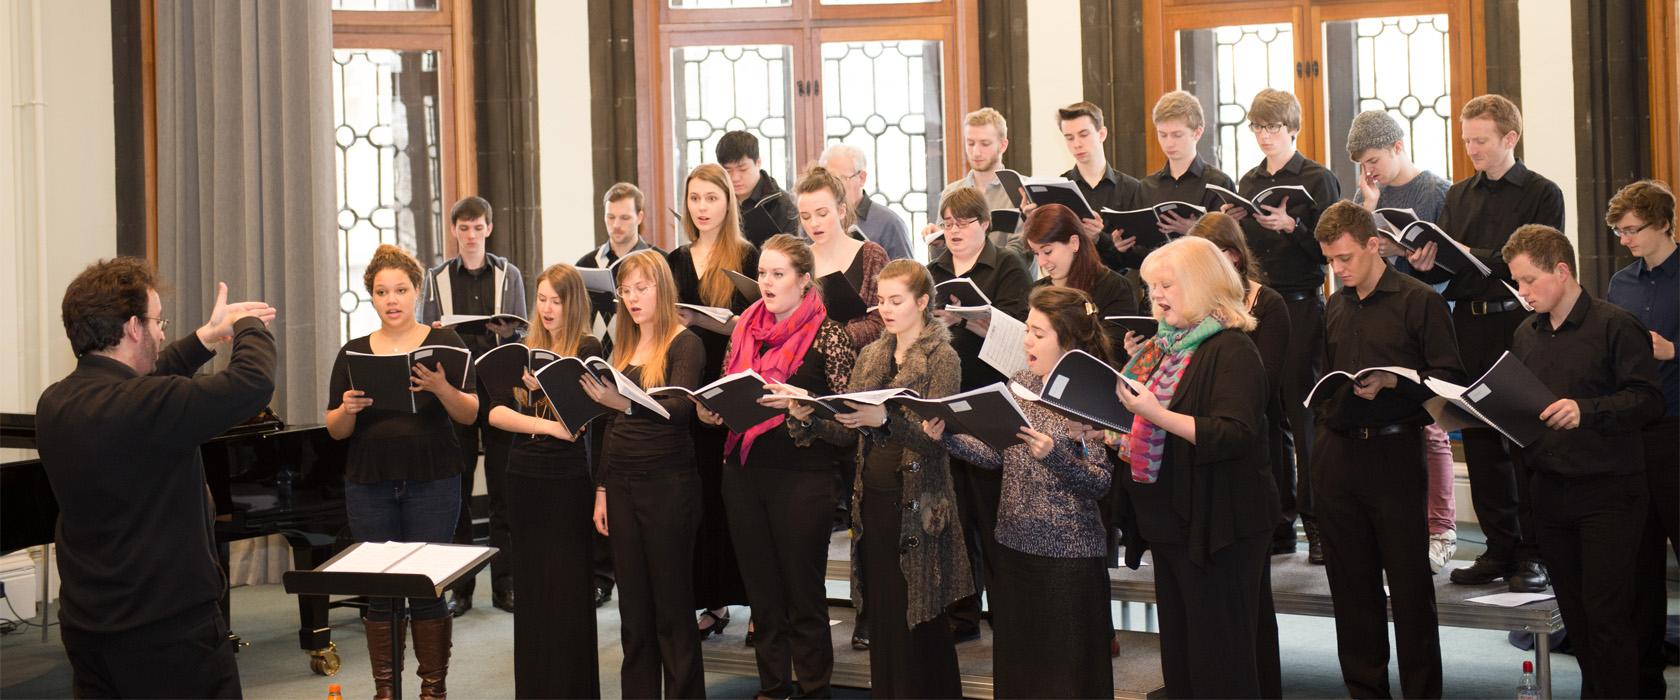 Robert Burns choral settings: from Schumann to MacMillan